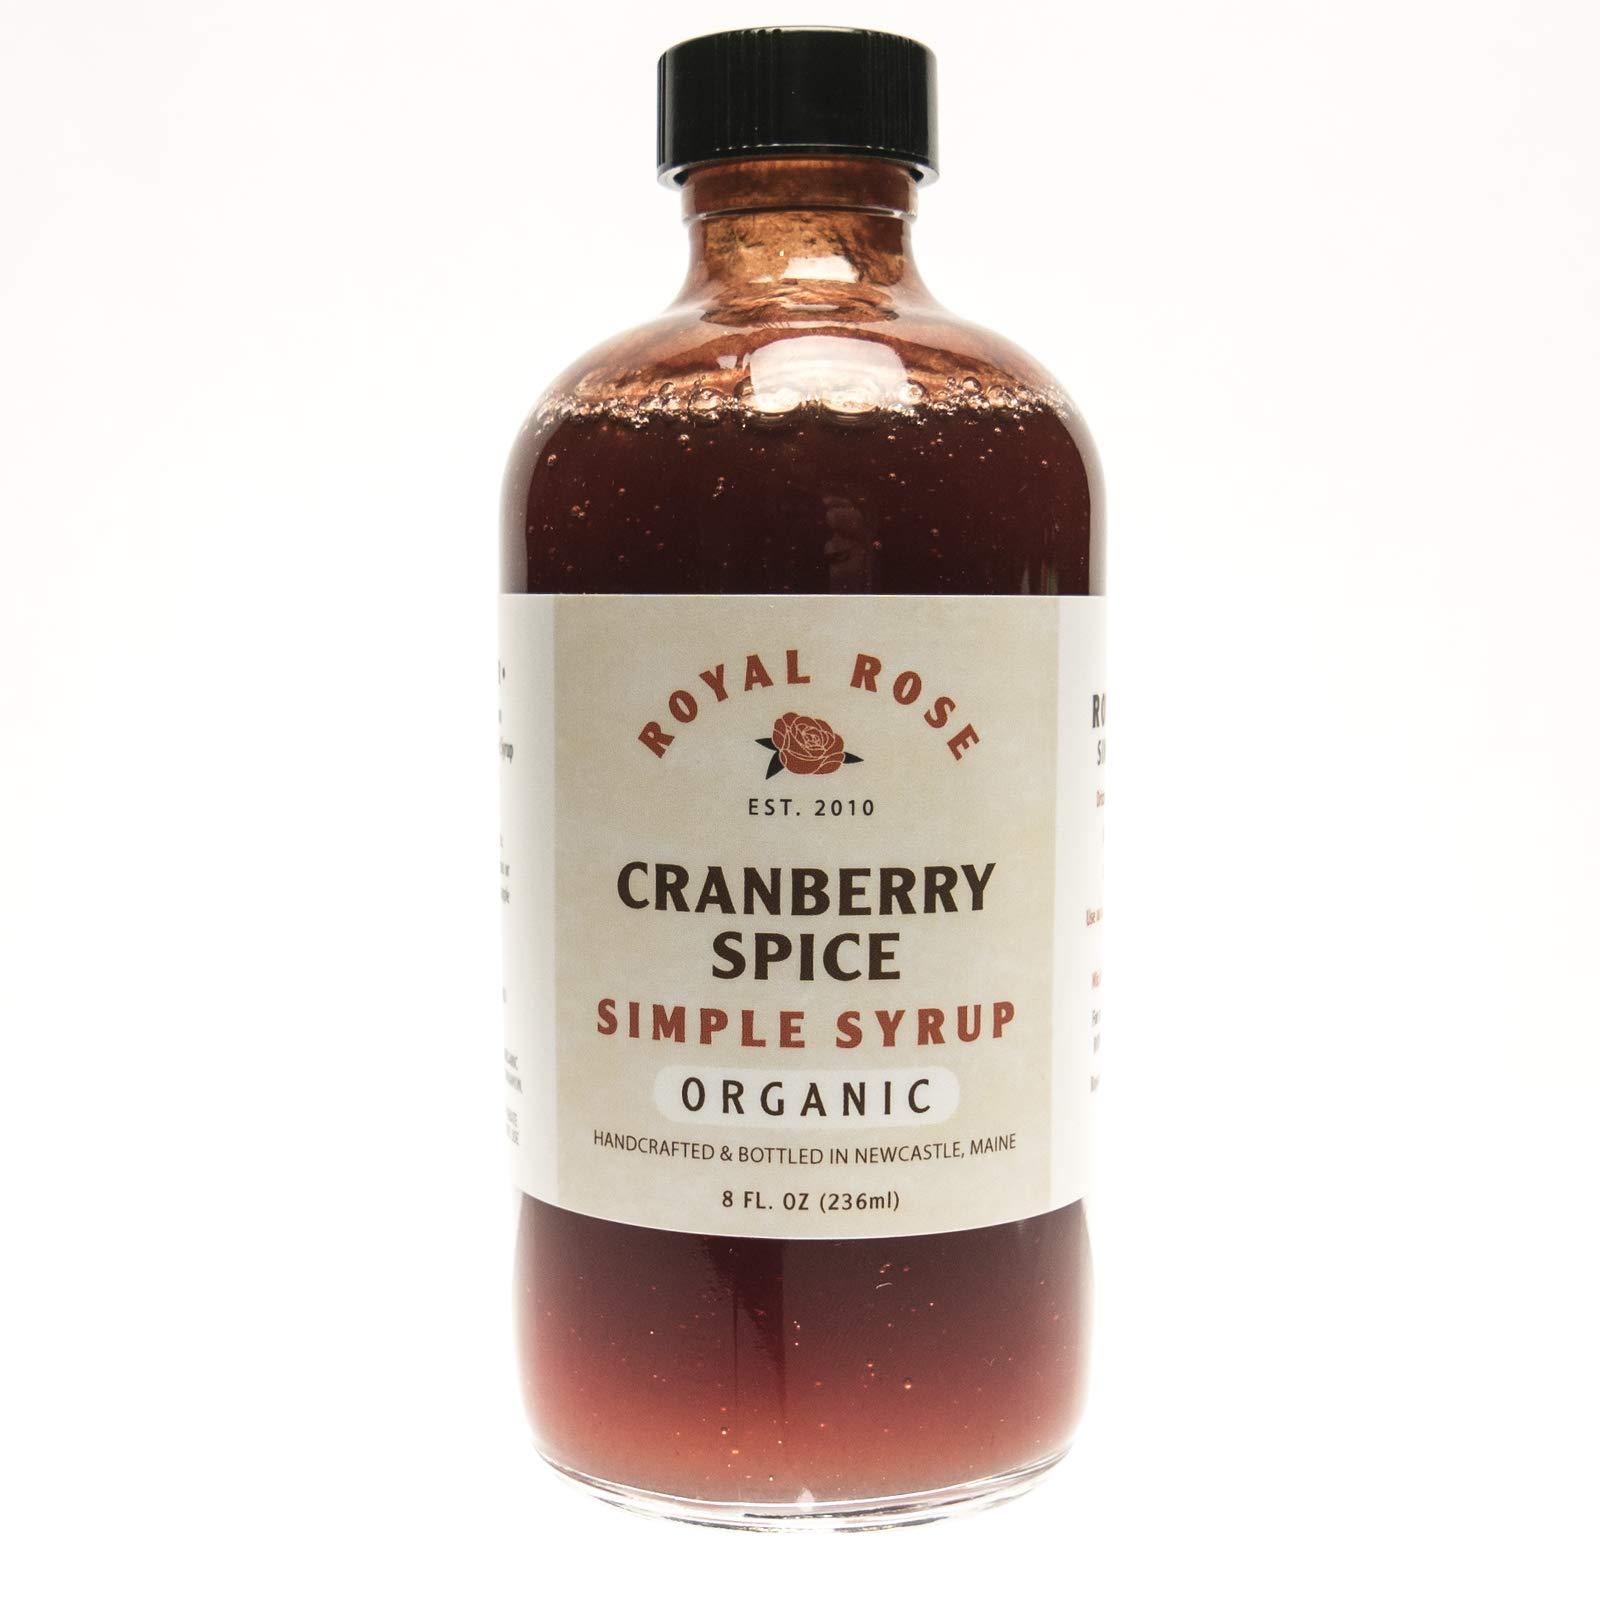 Royal Rose Organic Cranberry Spice Syrup, 8 oz